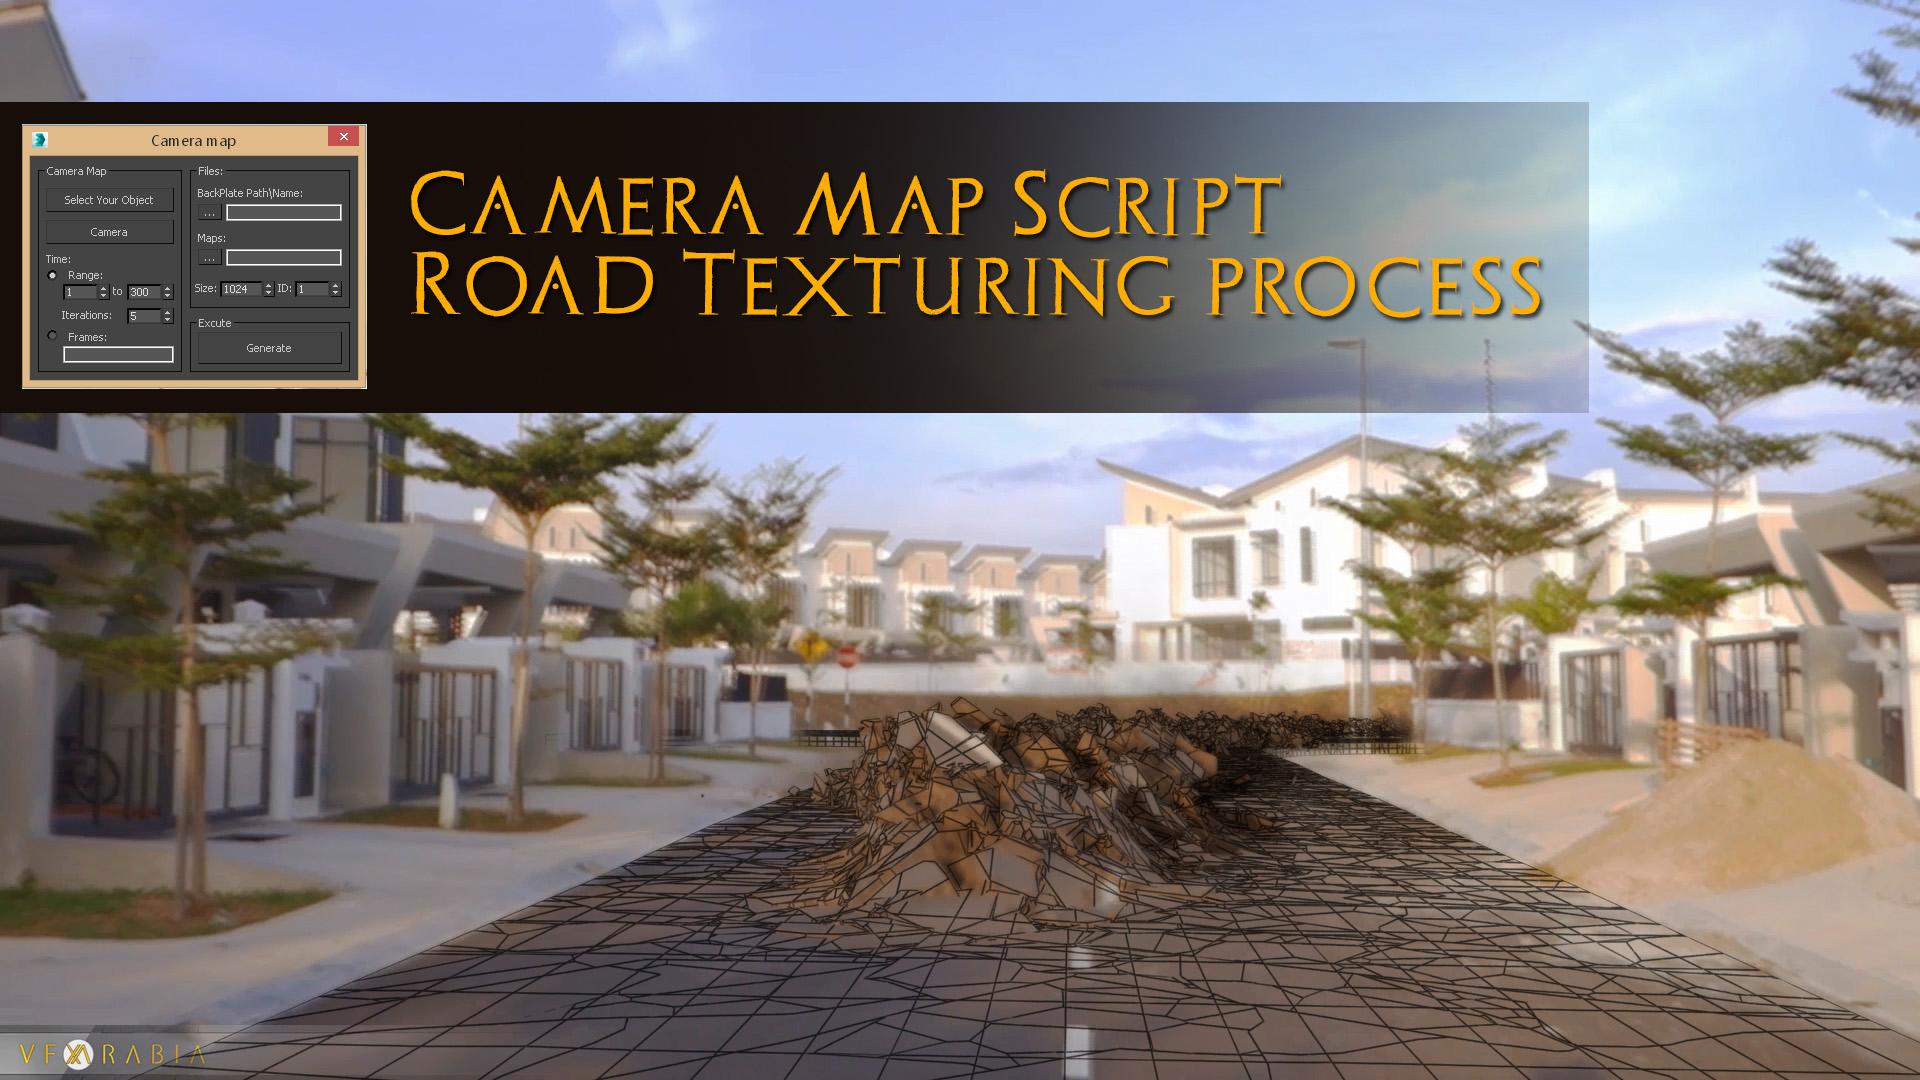 Camera map script